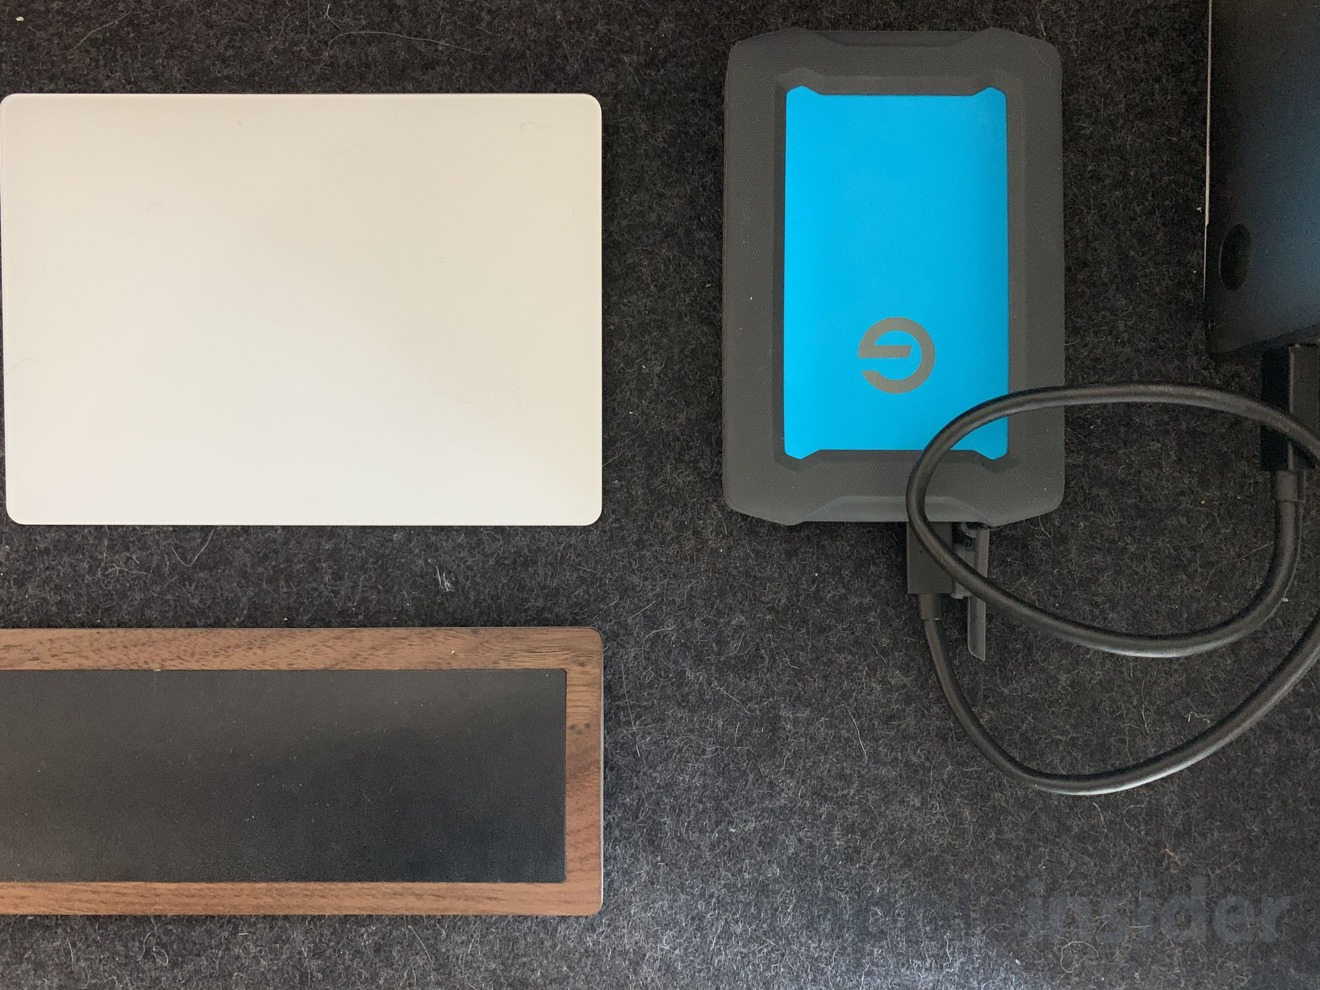 G|Drive ArmorATD rugged portable hard drive